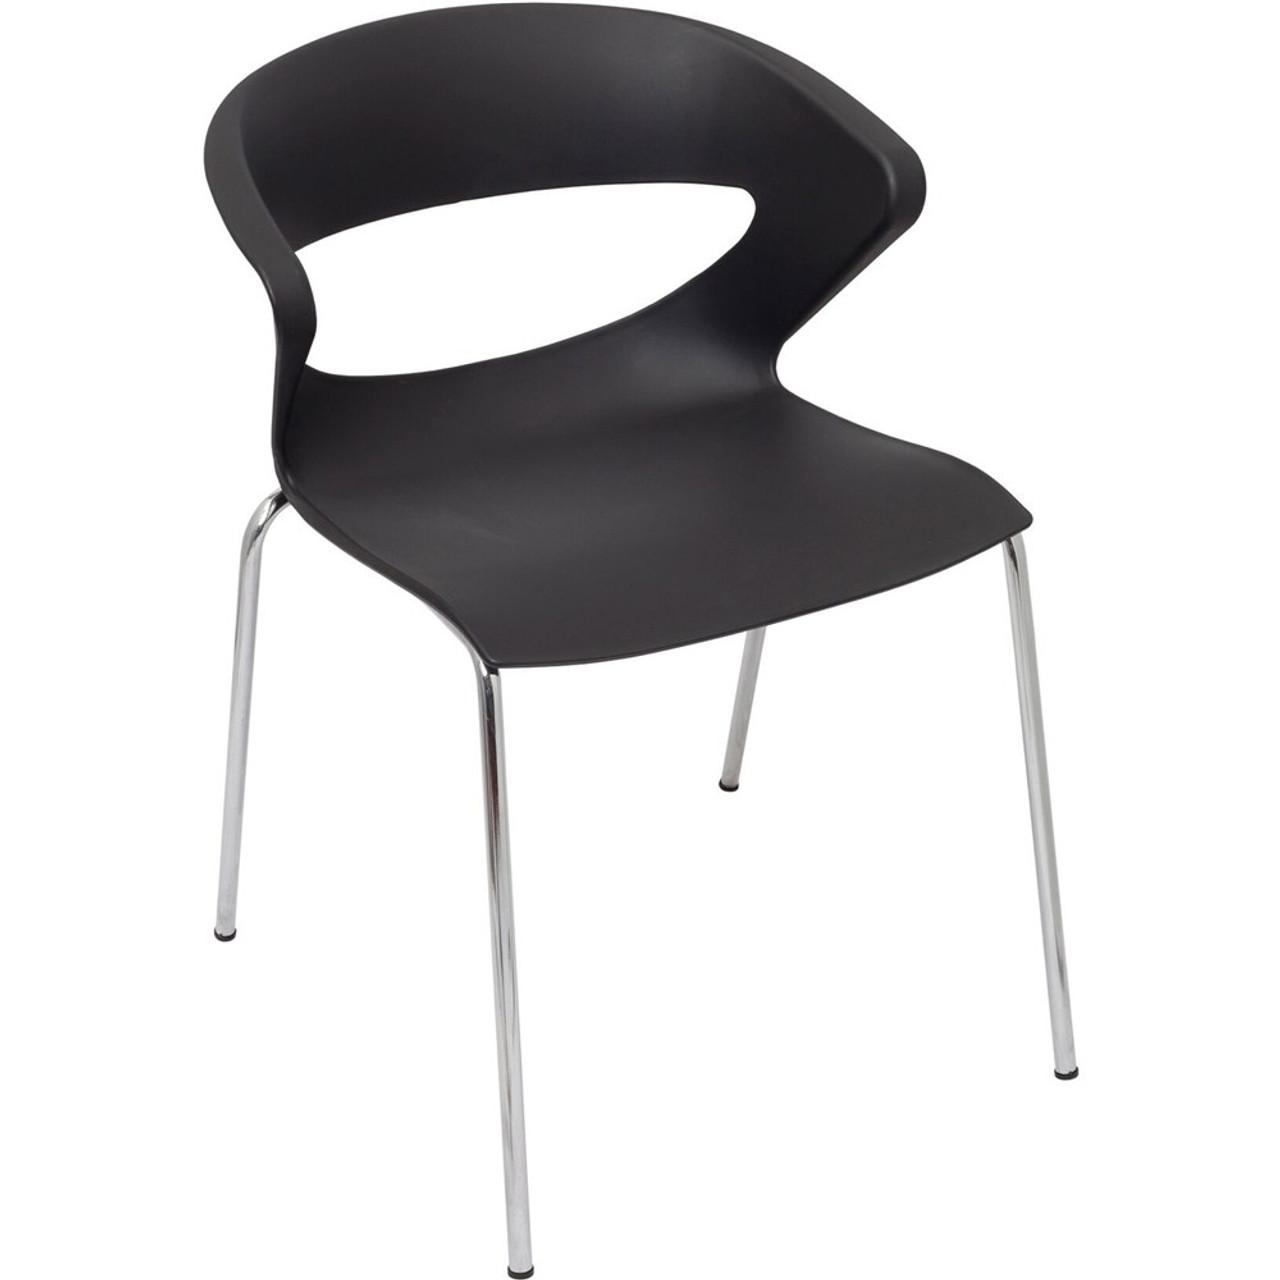 Rapidline Taurus Chair Hospitality Stacking Chairs Black